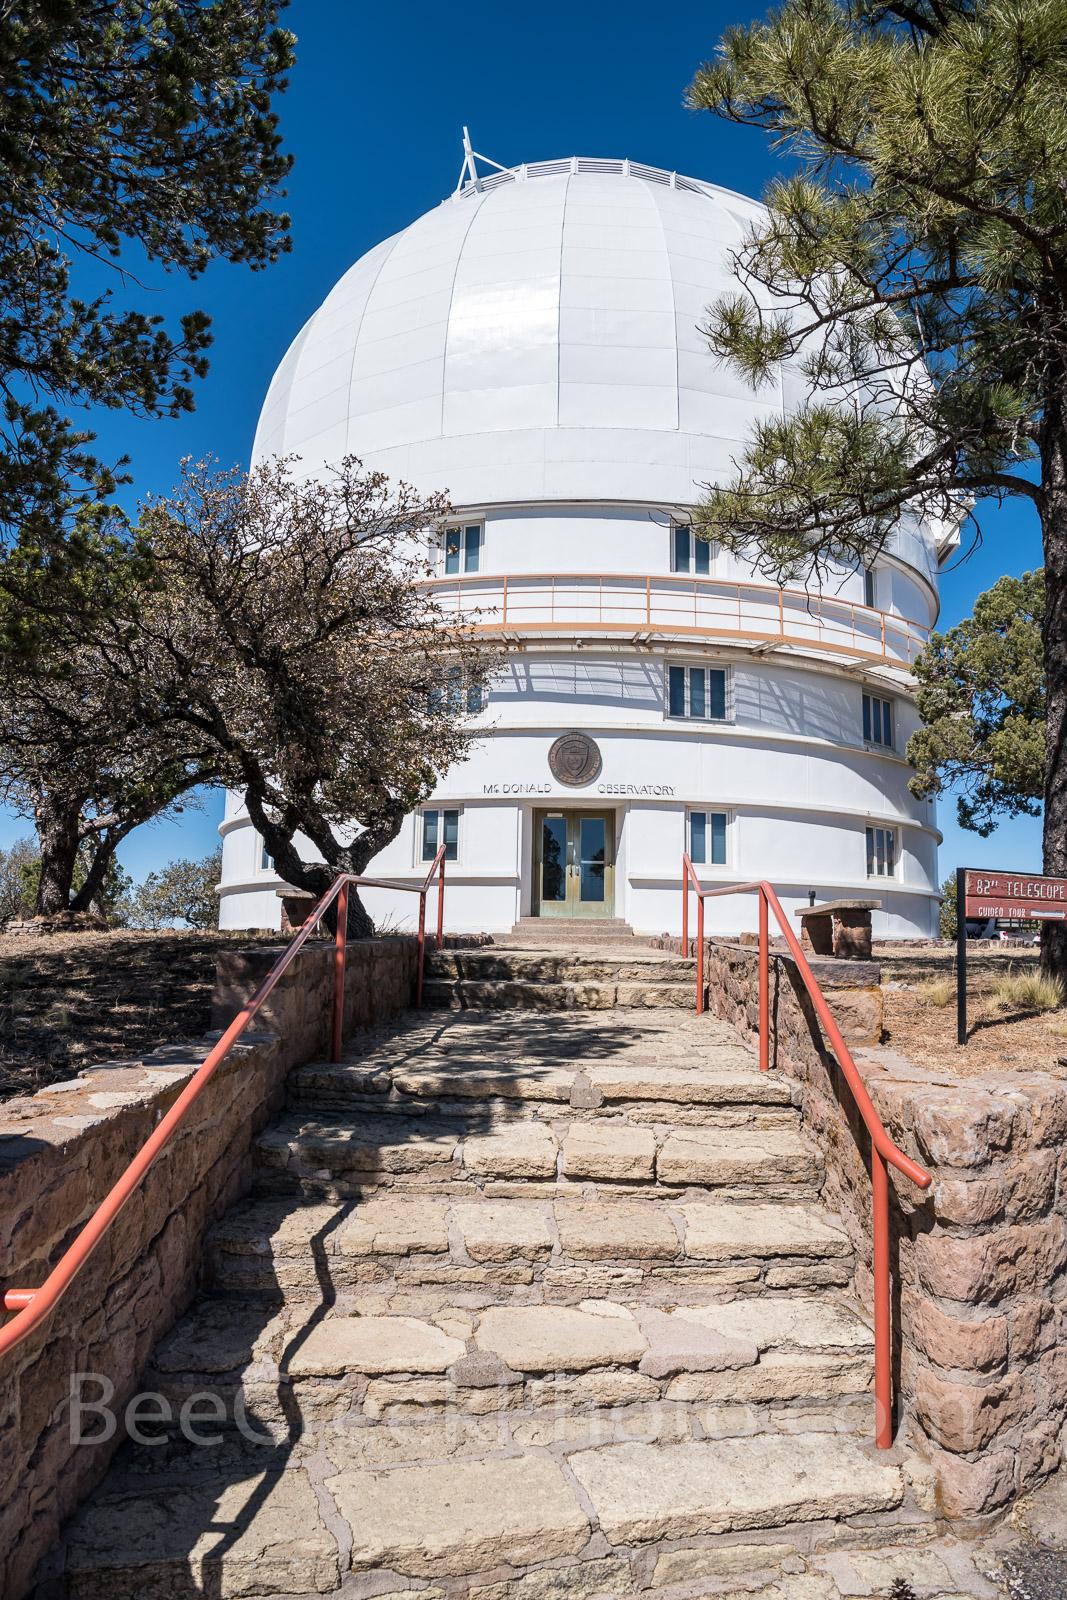 Otto Struve Telescope, Mount Locke, Mt Locke, Davis Mountains, Fort Davis, UT, Mcdonald observatory,  , photo